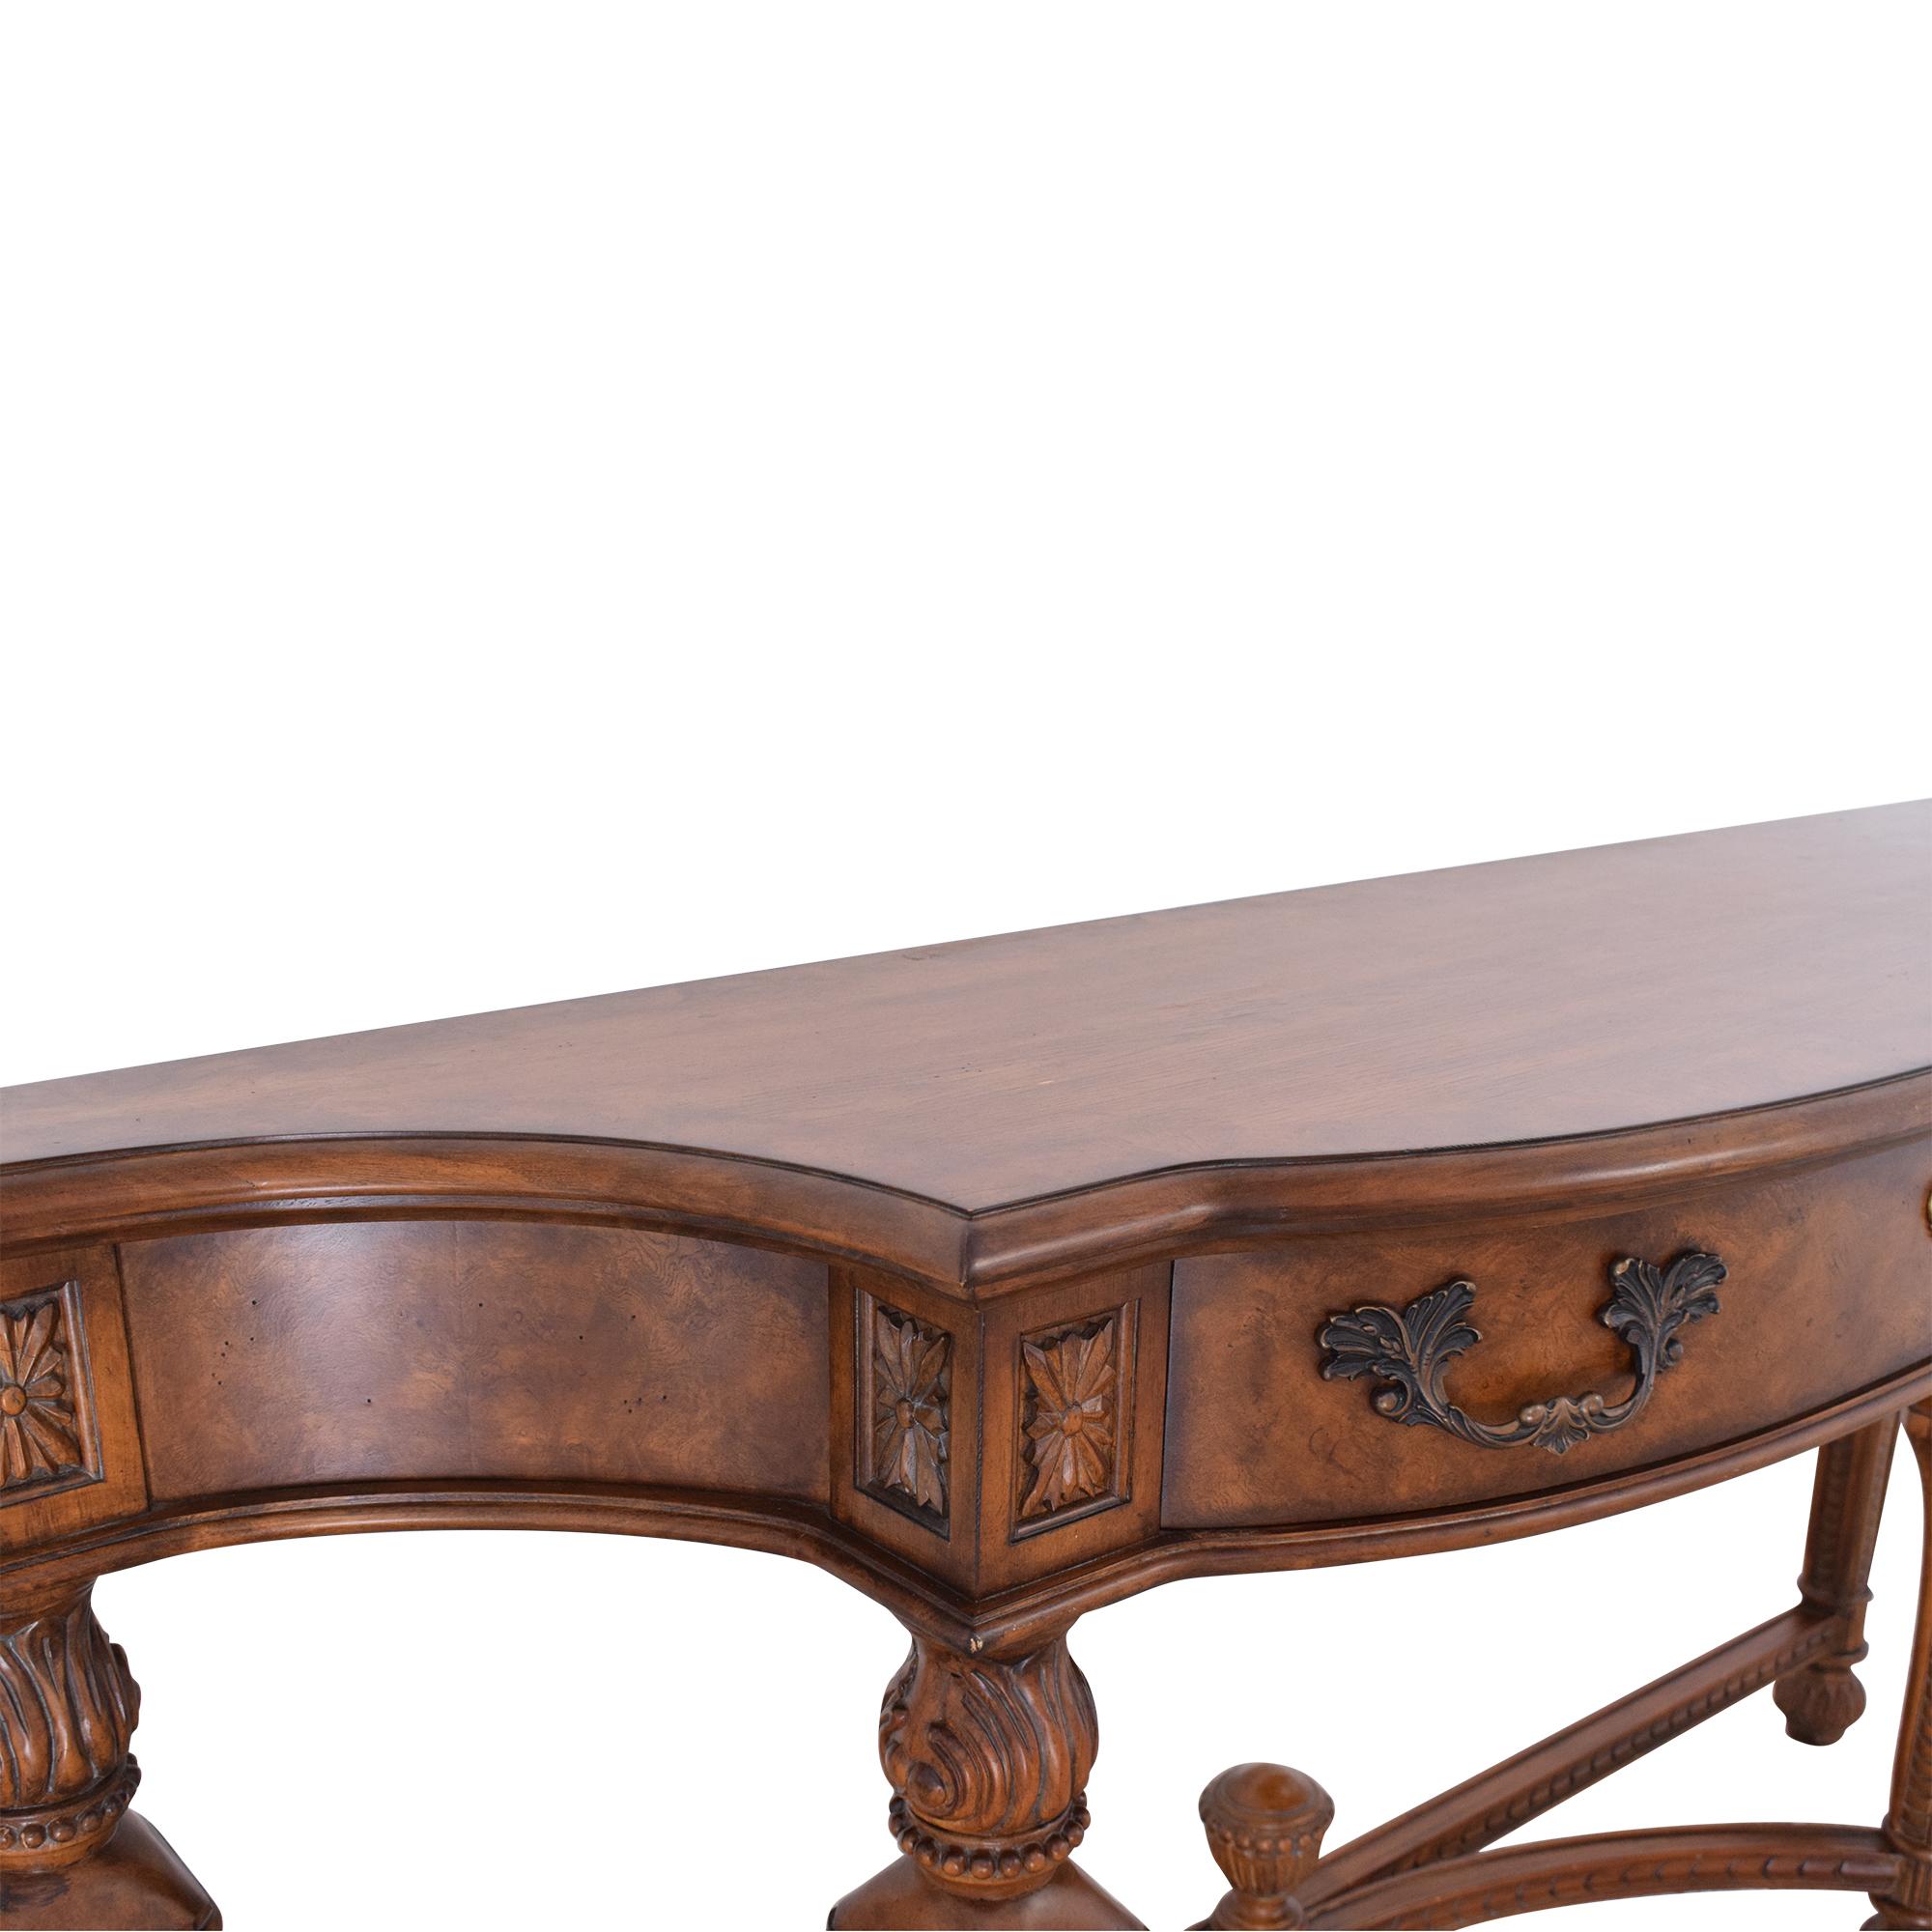 Drexel Heritage Drexel Heritage Console Table